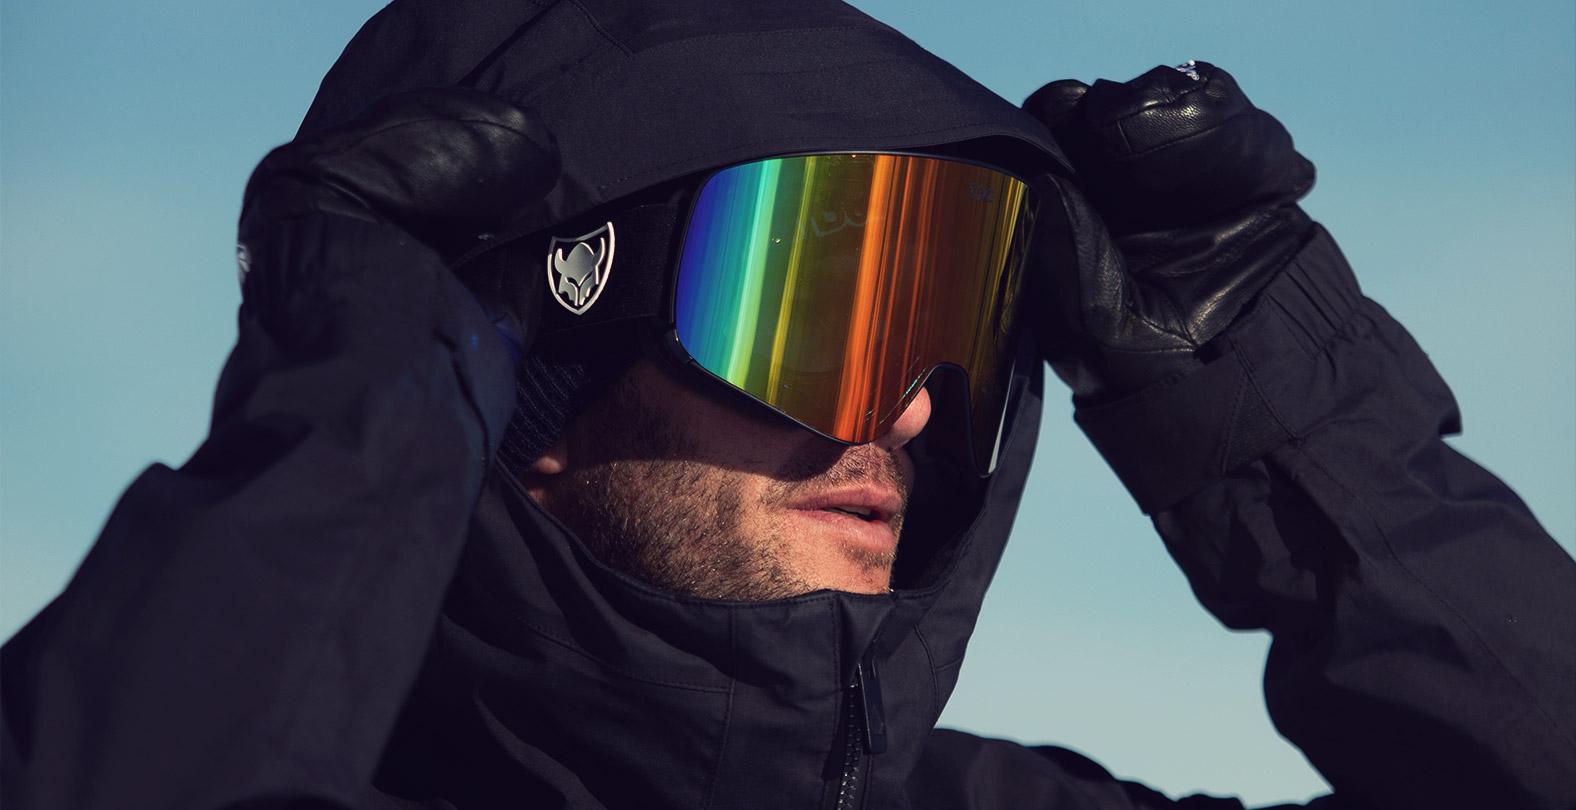 Markus Keller Portrait Snowboard Goggle